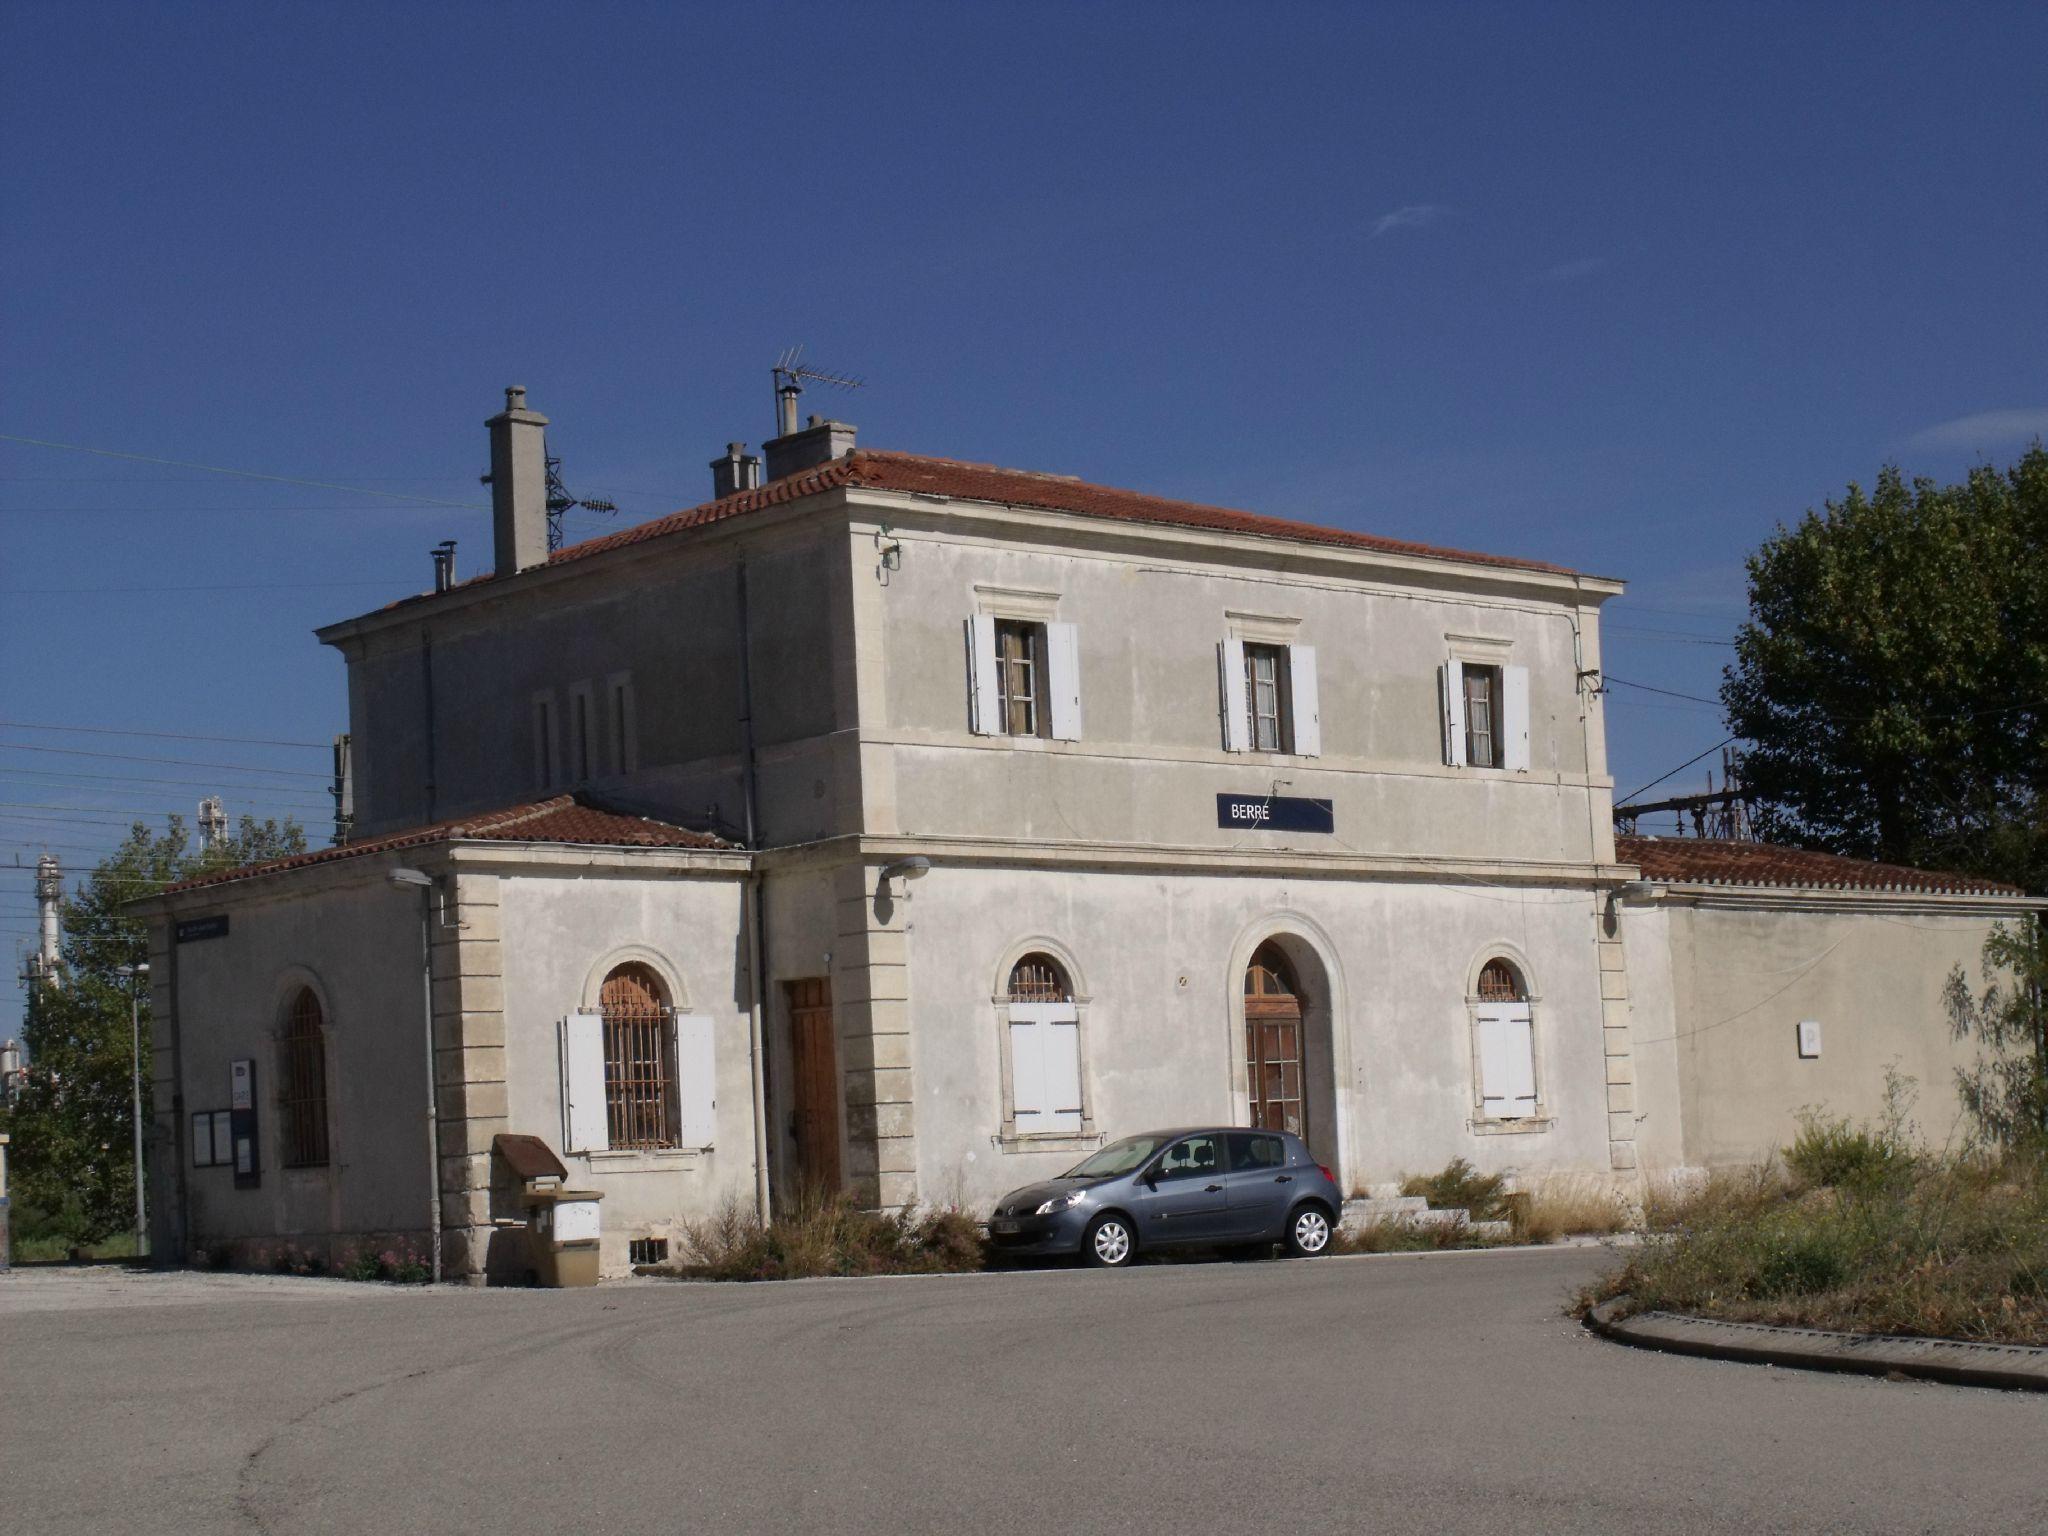 Berre (Bouches-du-Rhône - 13) 1